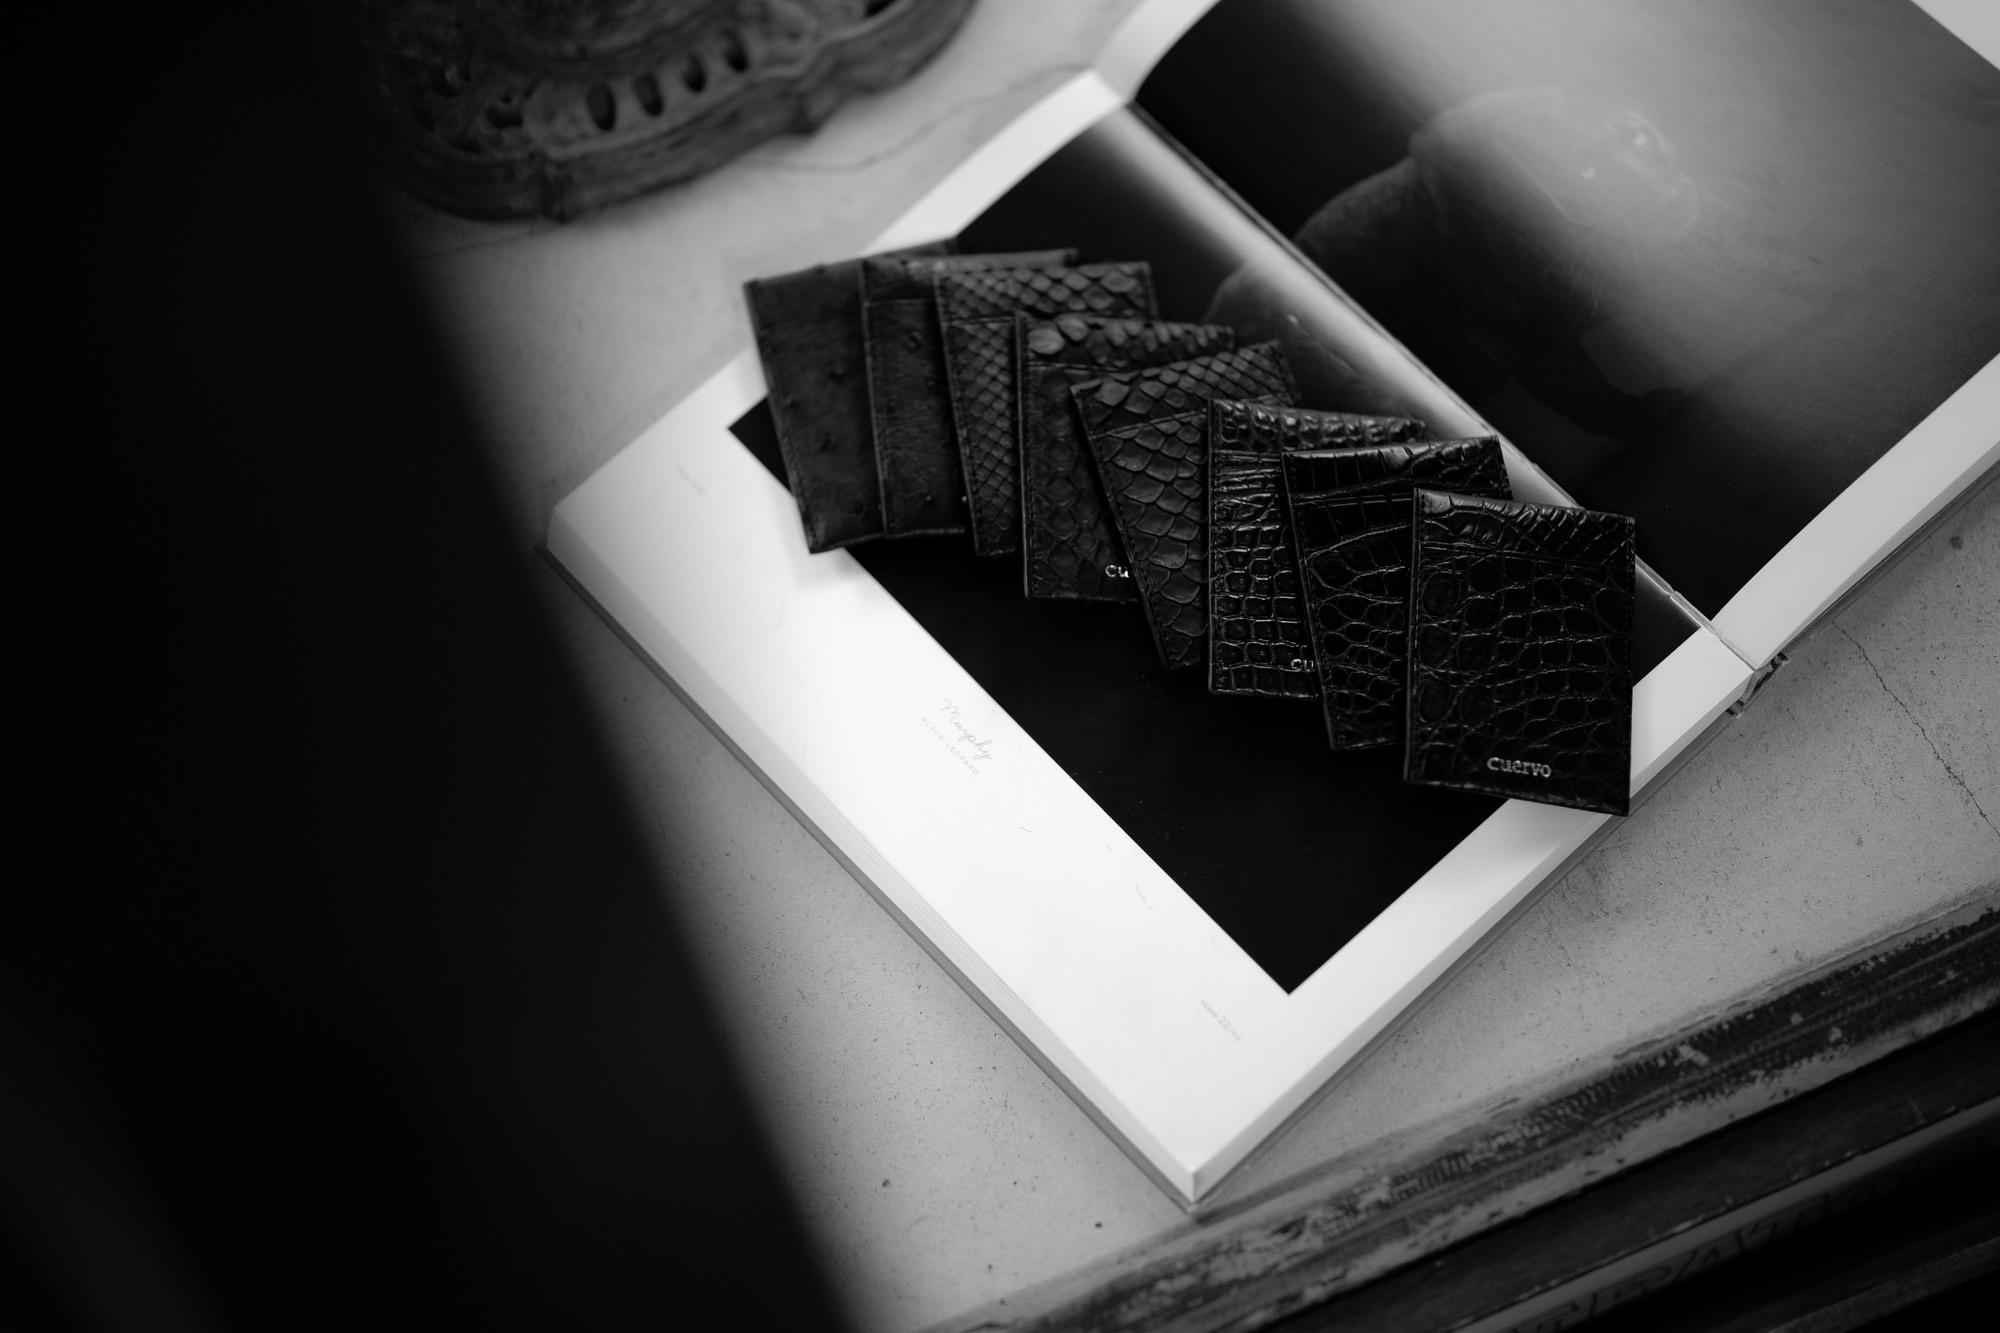 "cuervo bopoha Satisfaction Leather Collection ""Thelonious"" // Crocodile Leather , Python Leather , Ostrich Leather 2020AW 【Special Model】愛知 名古屋 Alto e Diritto altoediritto アルトエデリット cuervobopoha Thelonious セロニアス クエルボヴァローナ クロコダイルレザー オーストリッチレザー パイソンレザー カードケース クレジットカードケース JAZZ ジャズ"